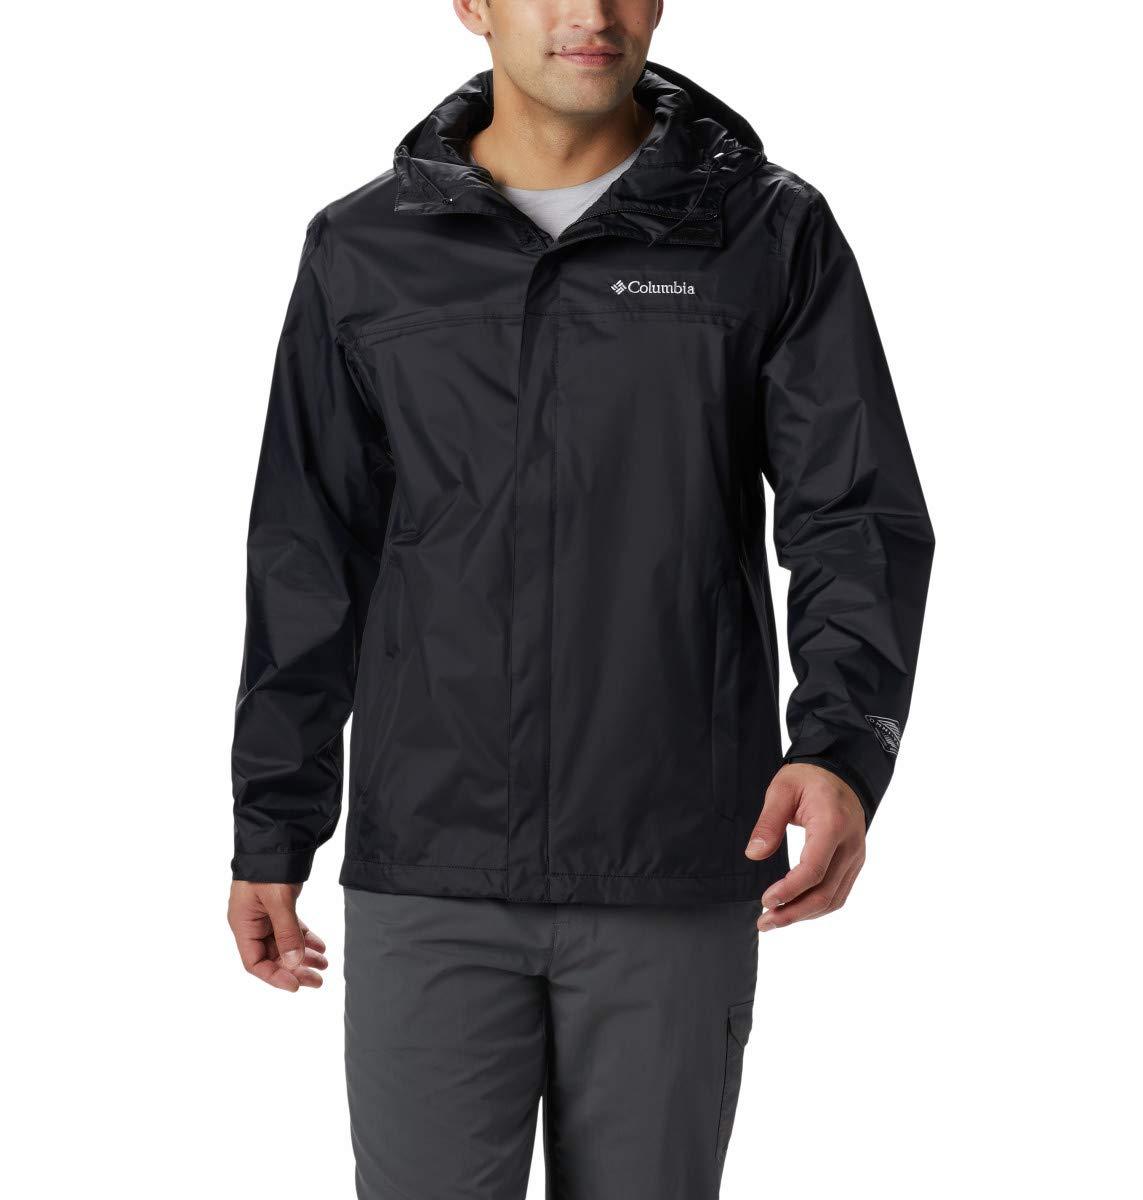 Columbia Men's Watertight Ii Jacket, Black, 1X